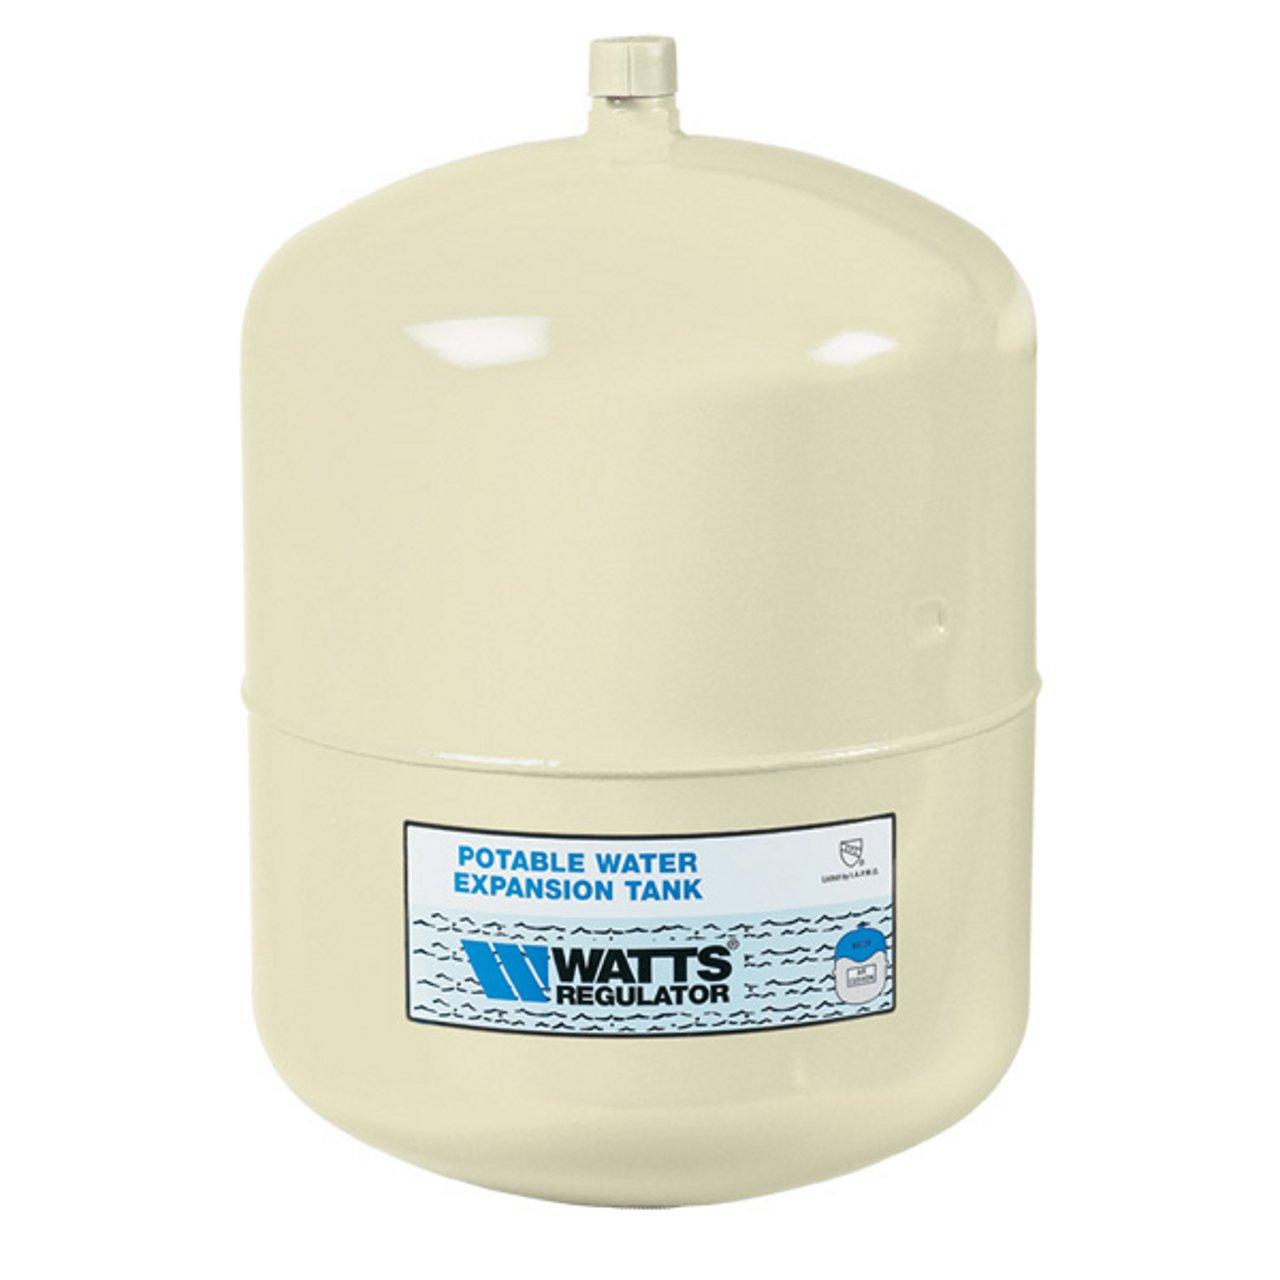 WATTS WATER TECHNOLOGIES GIDDS-1030402 Watts Potable Water Expansion Tank, Model #Plt-12, Stainless Steel Nipple, 4.5 Gallon, Lead Free - 1030402